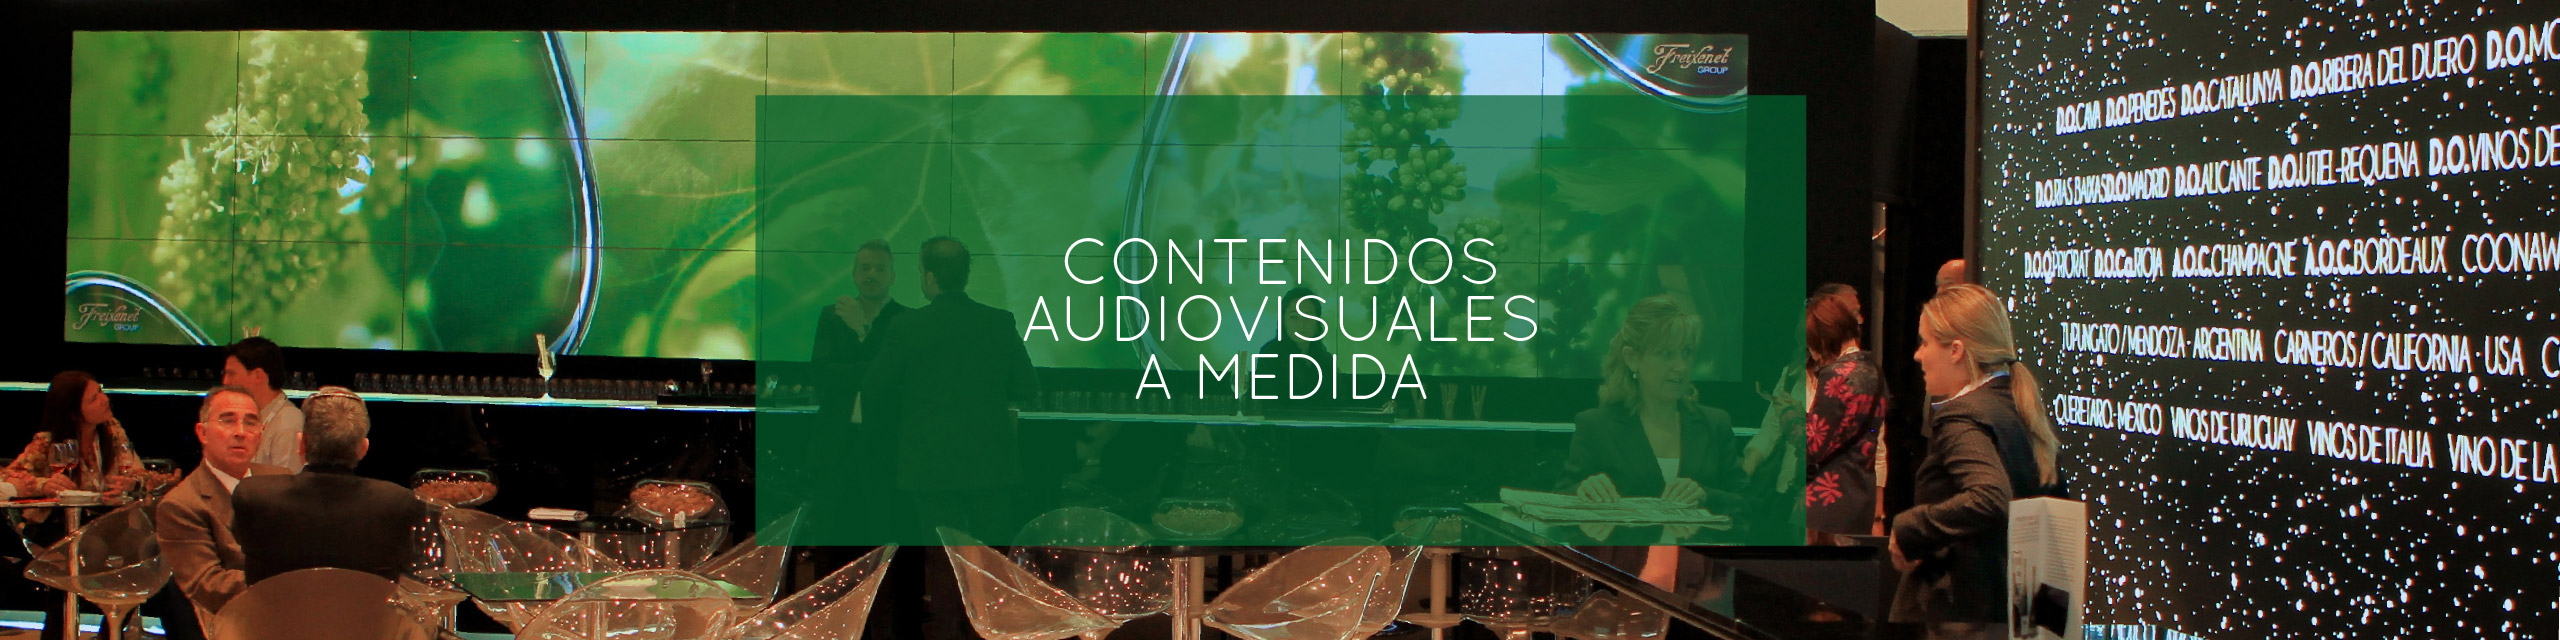 contenidos-audiovisuales